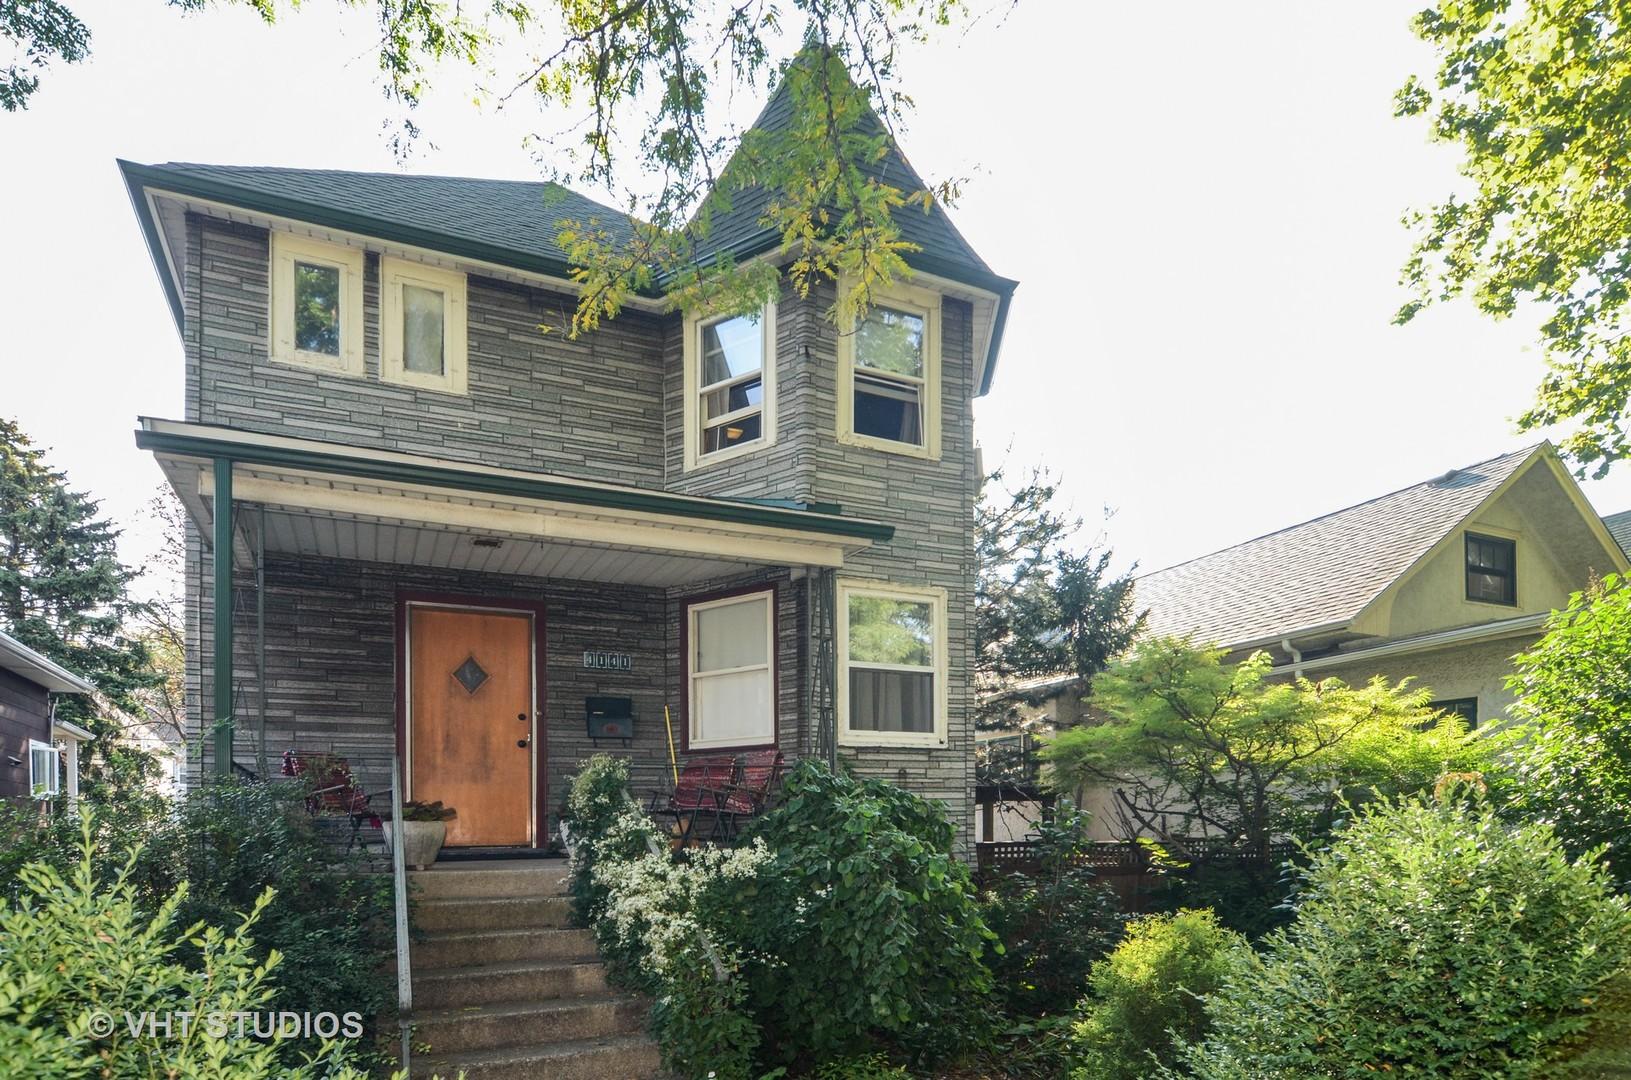 4141 N Ridgeway Exterior Photo